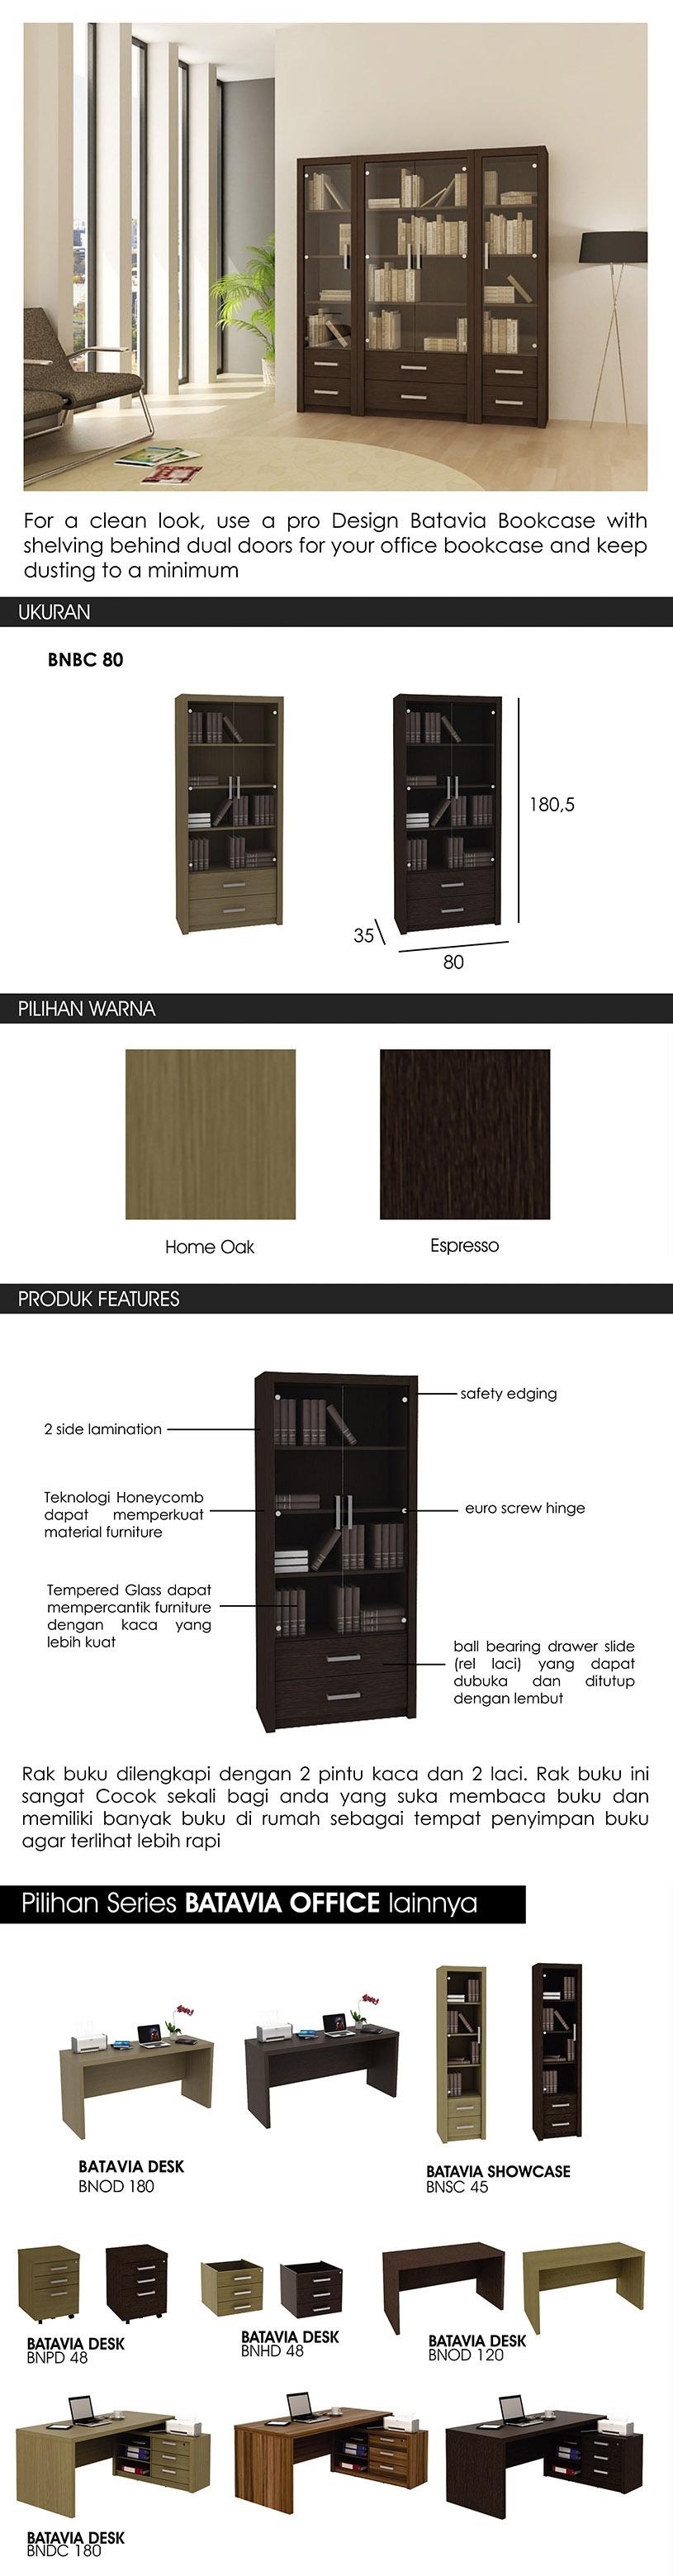 Pro Design Aquila Rak Buku Kantor 80 S Sanremo Light Khusus Jawa Brico Tv Dark Black Batavia 2 Pintu Kaca Laci Espresso